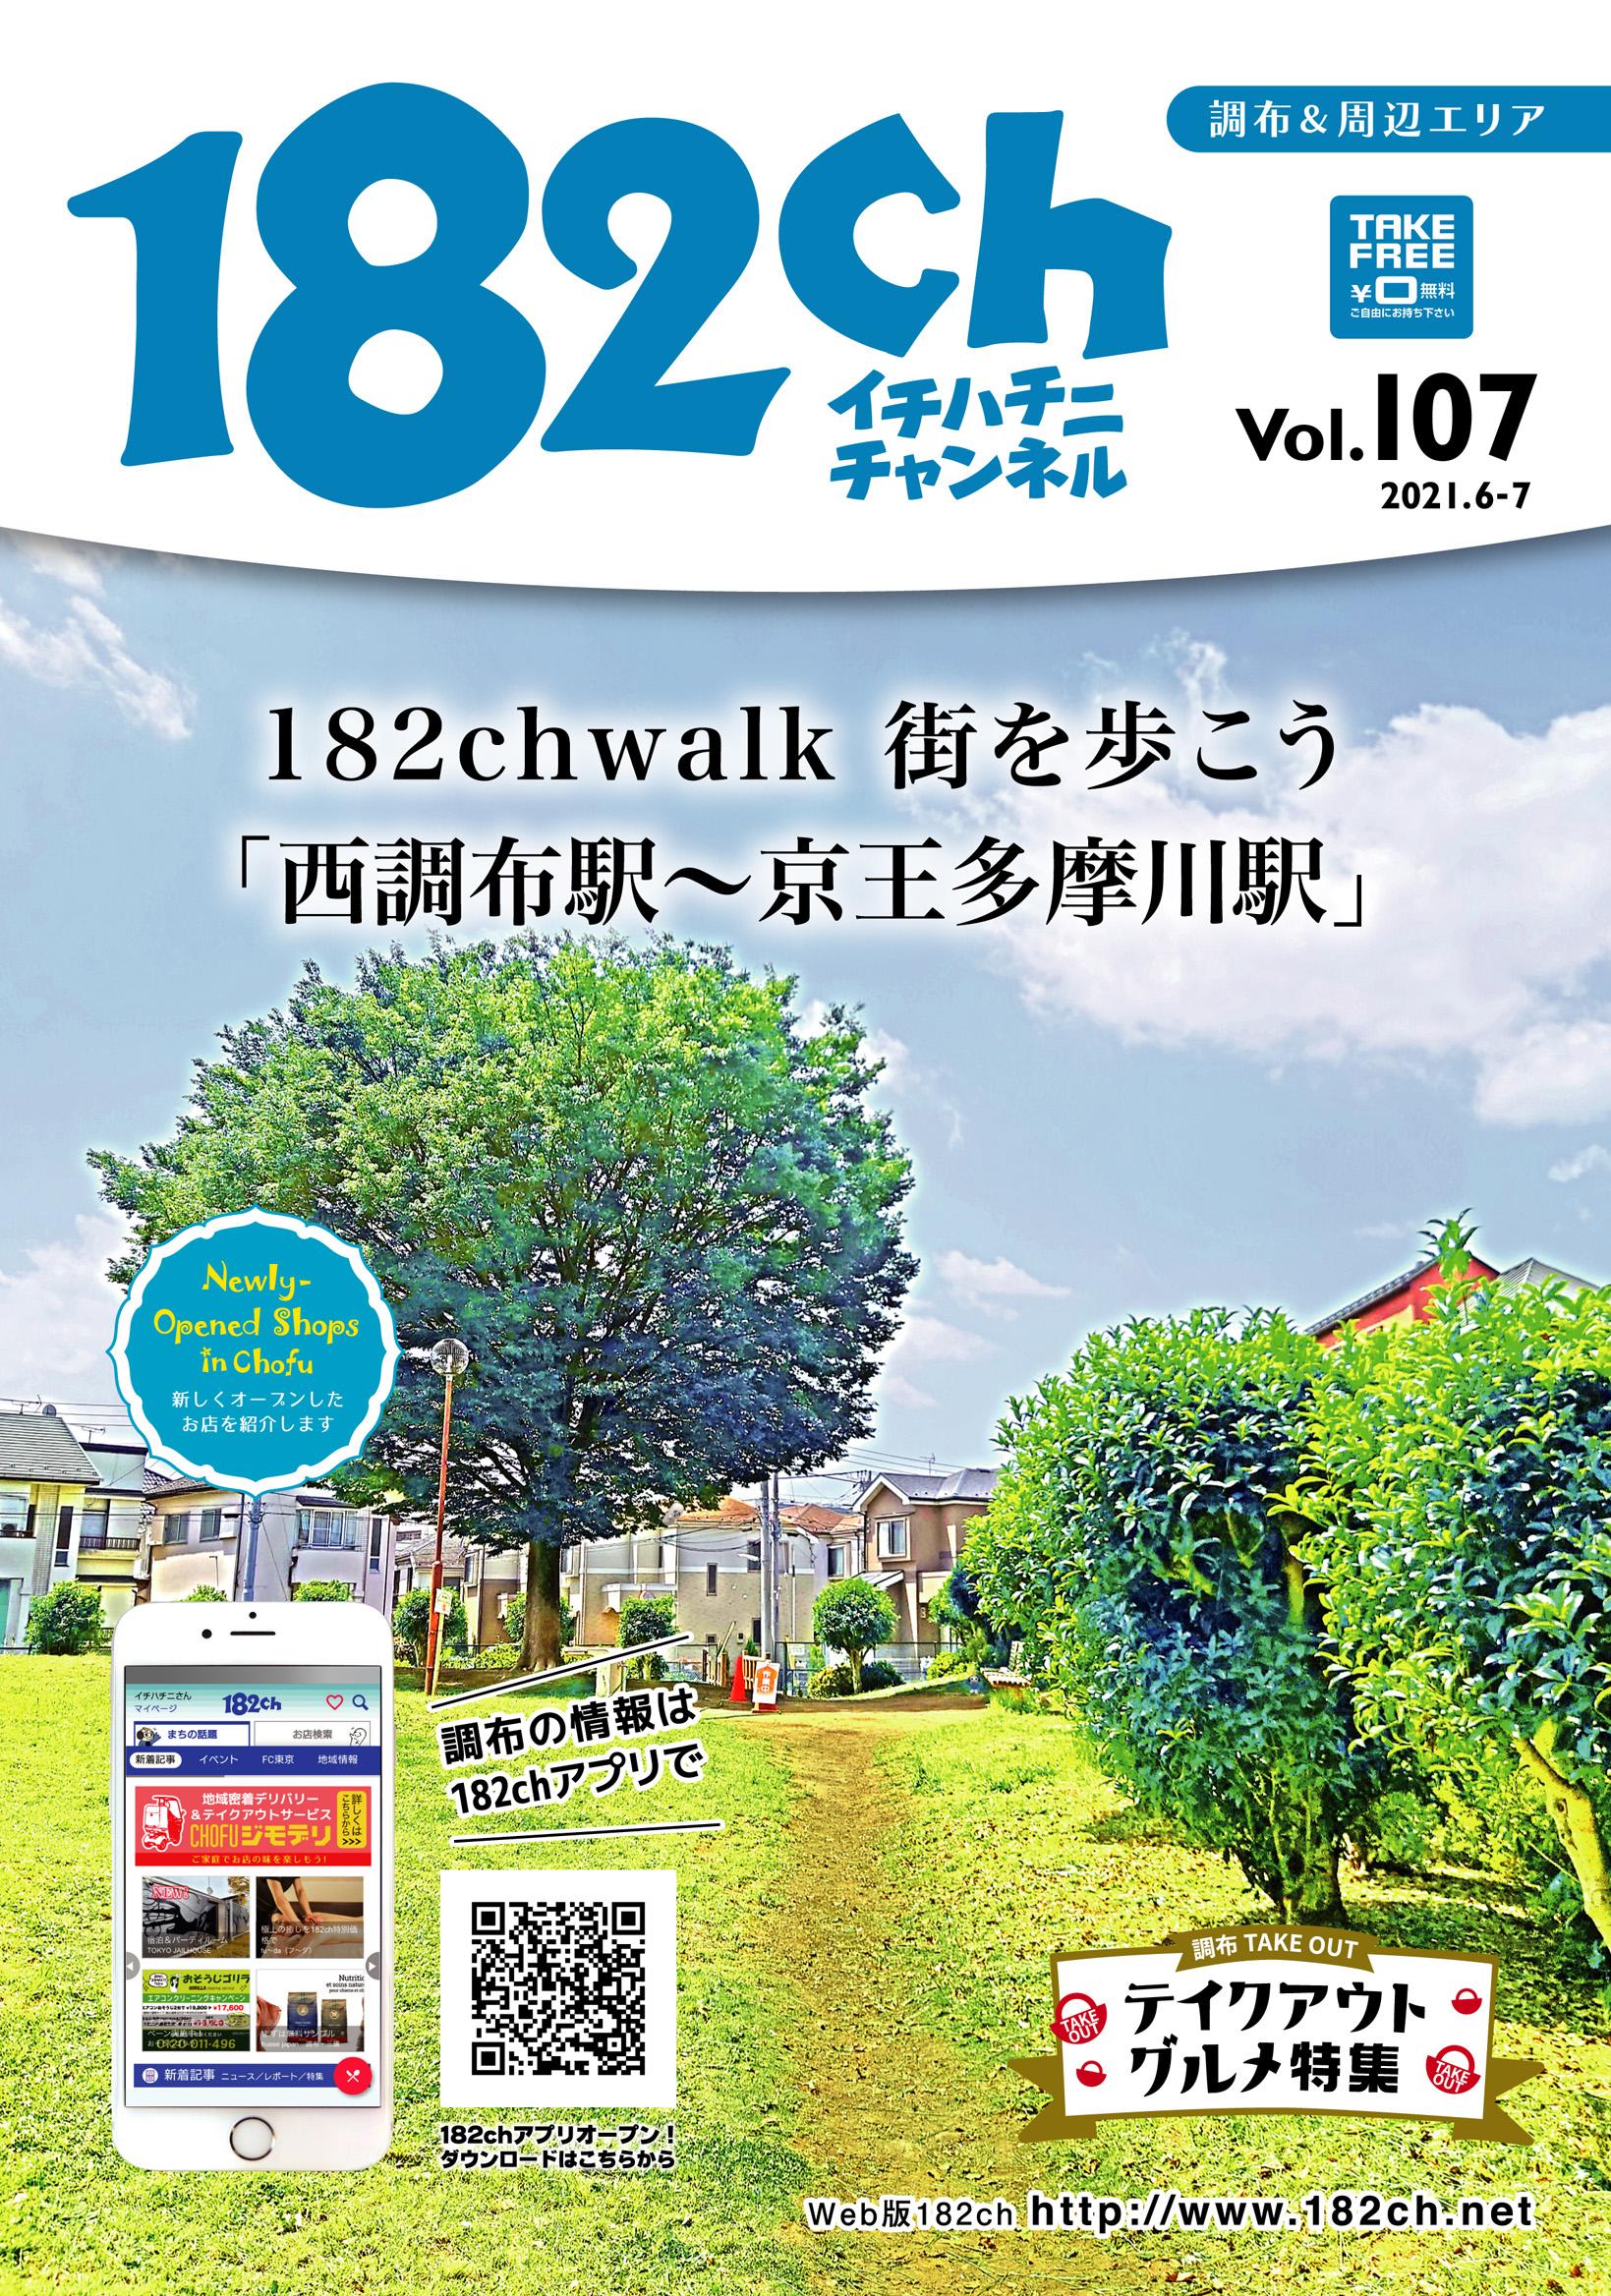 182ch vol.107